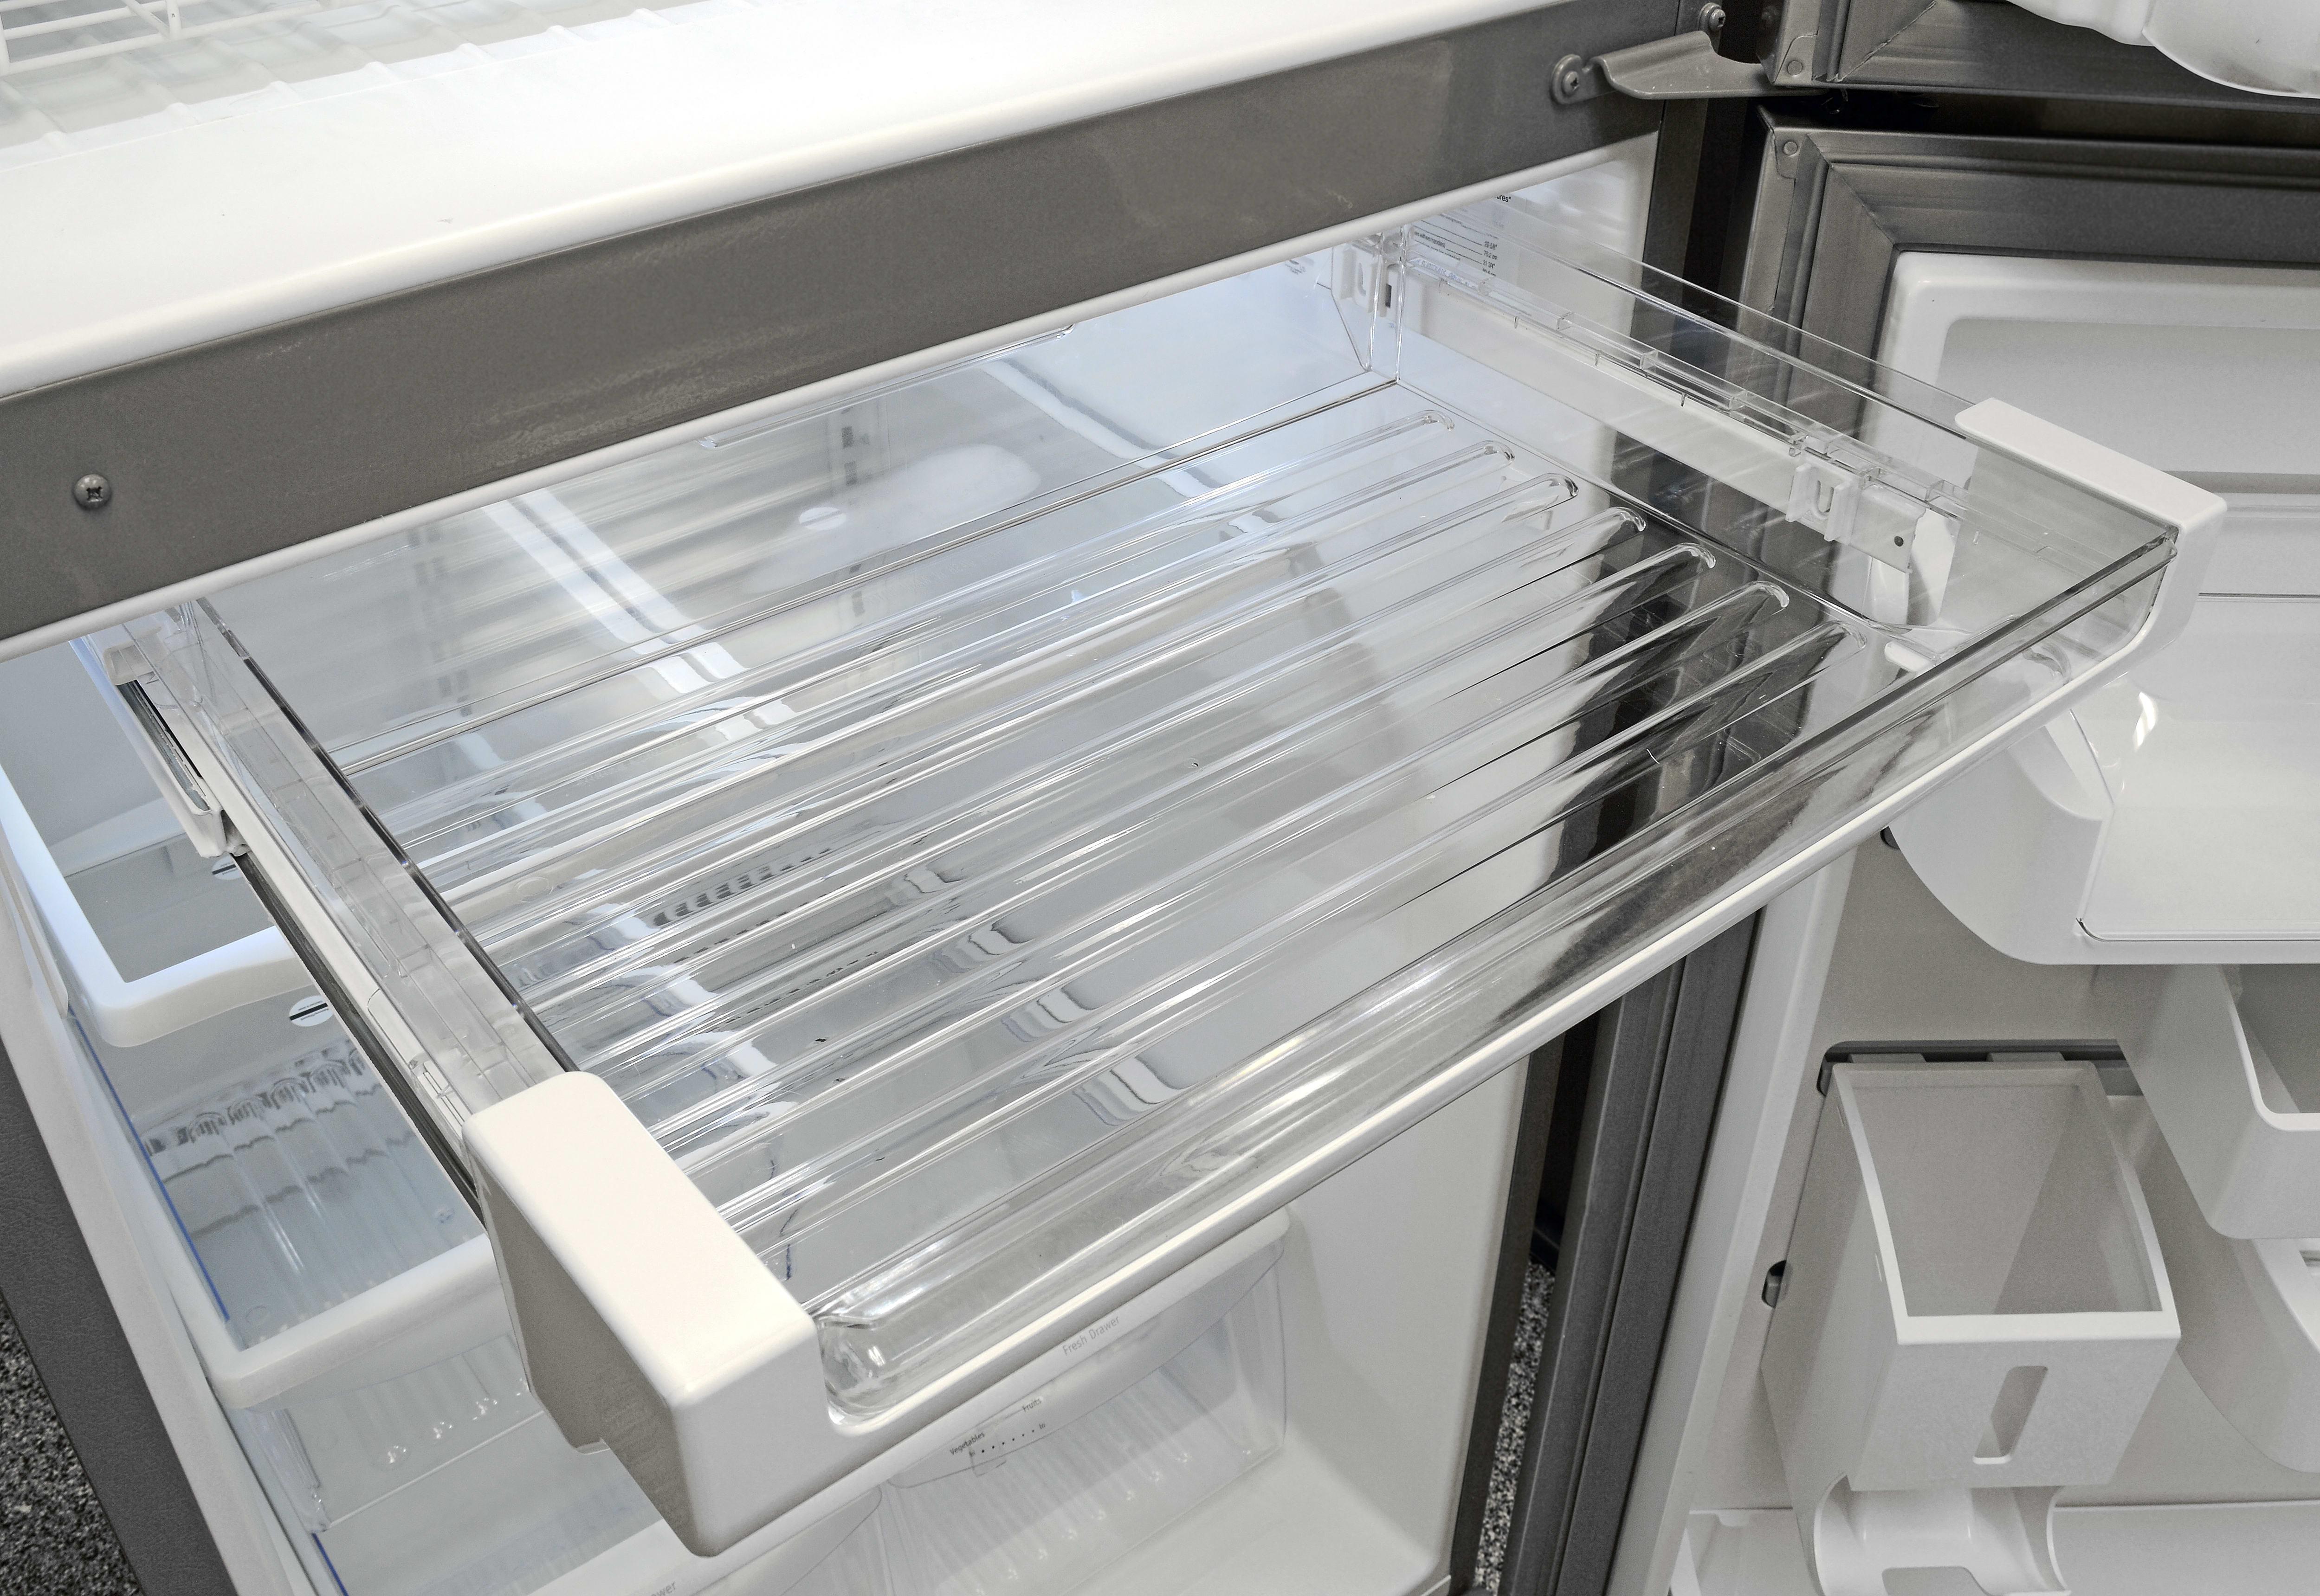 images and stainless cubic arline feet cooler monroe drawer refrigerators compact on refrigerator best fridge fringes steel single reversible dorr pinterest costway freezer